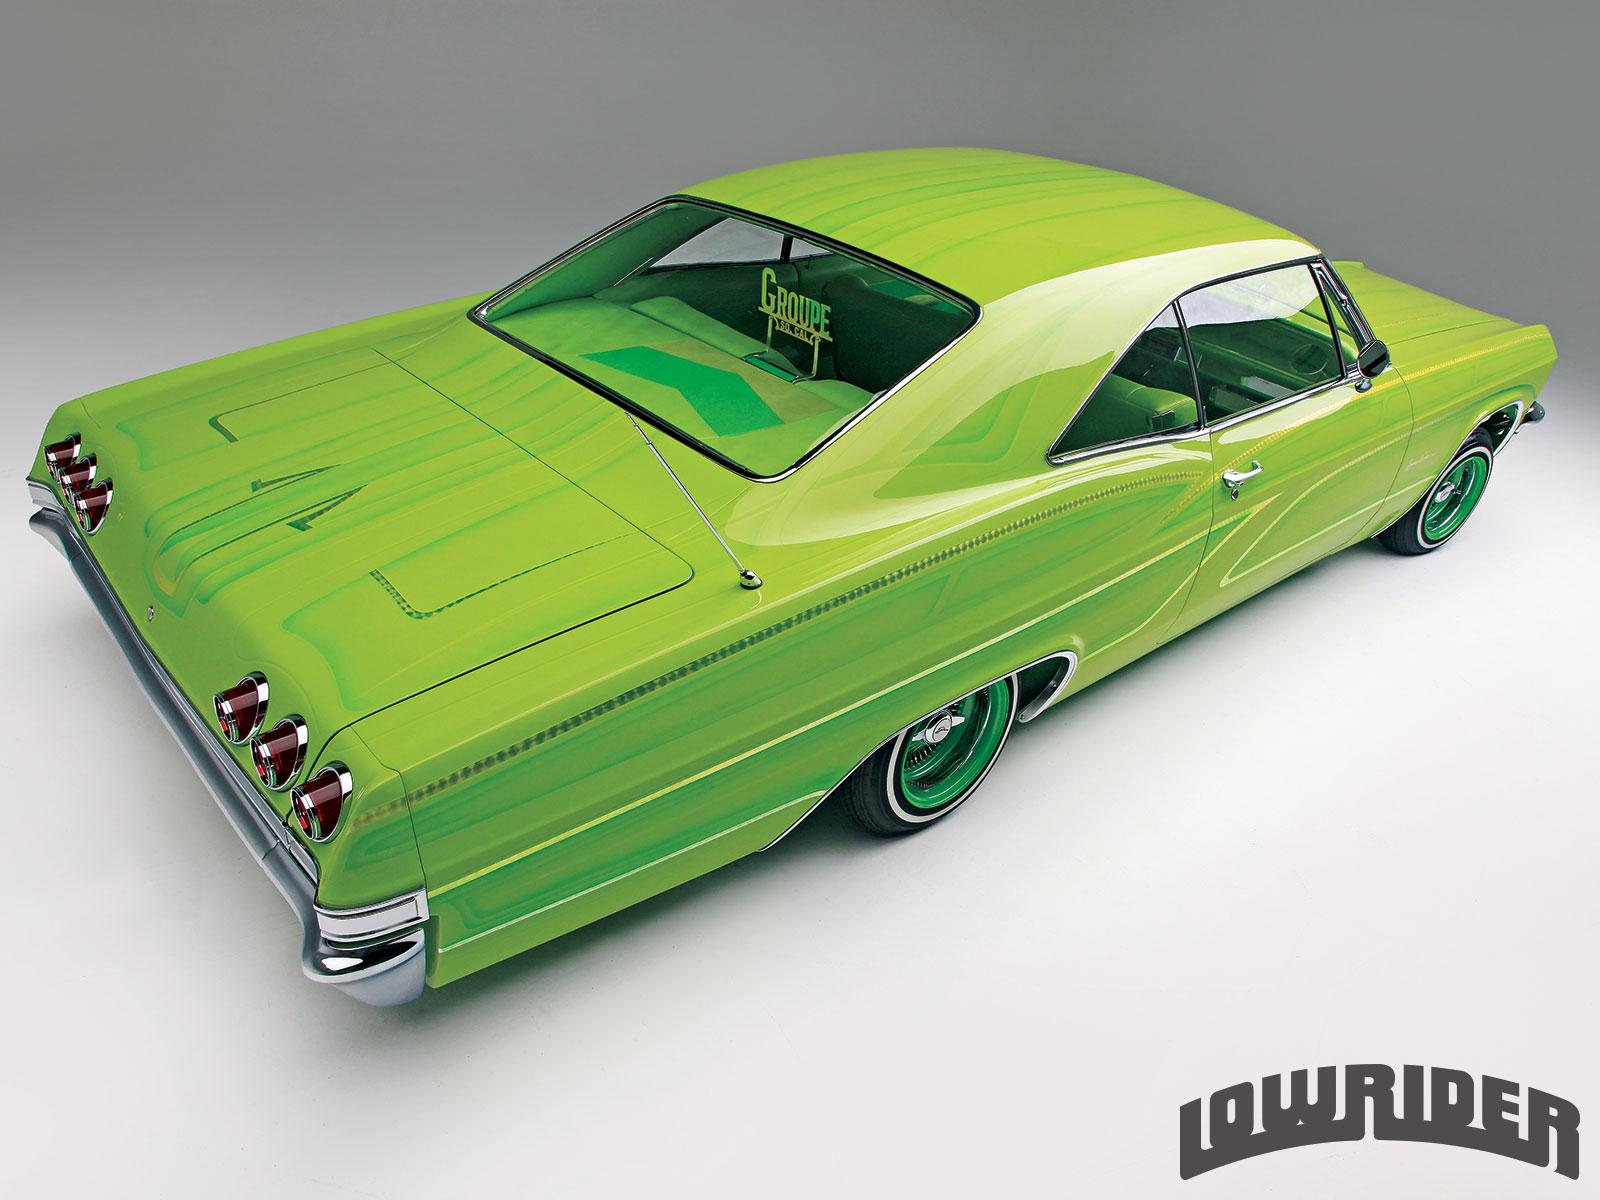 1965 Chevrolet Impala Lowrider Magazine Chevy Rear Wiring 3 25